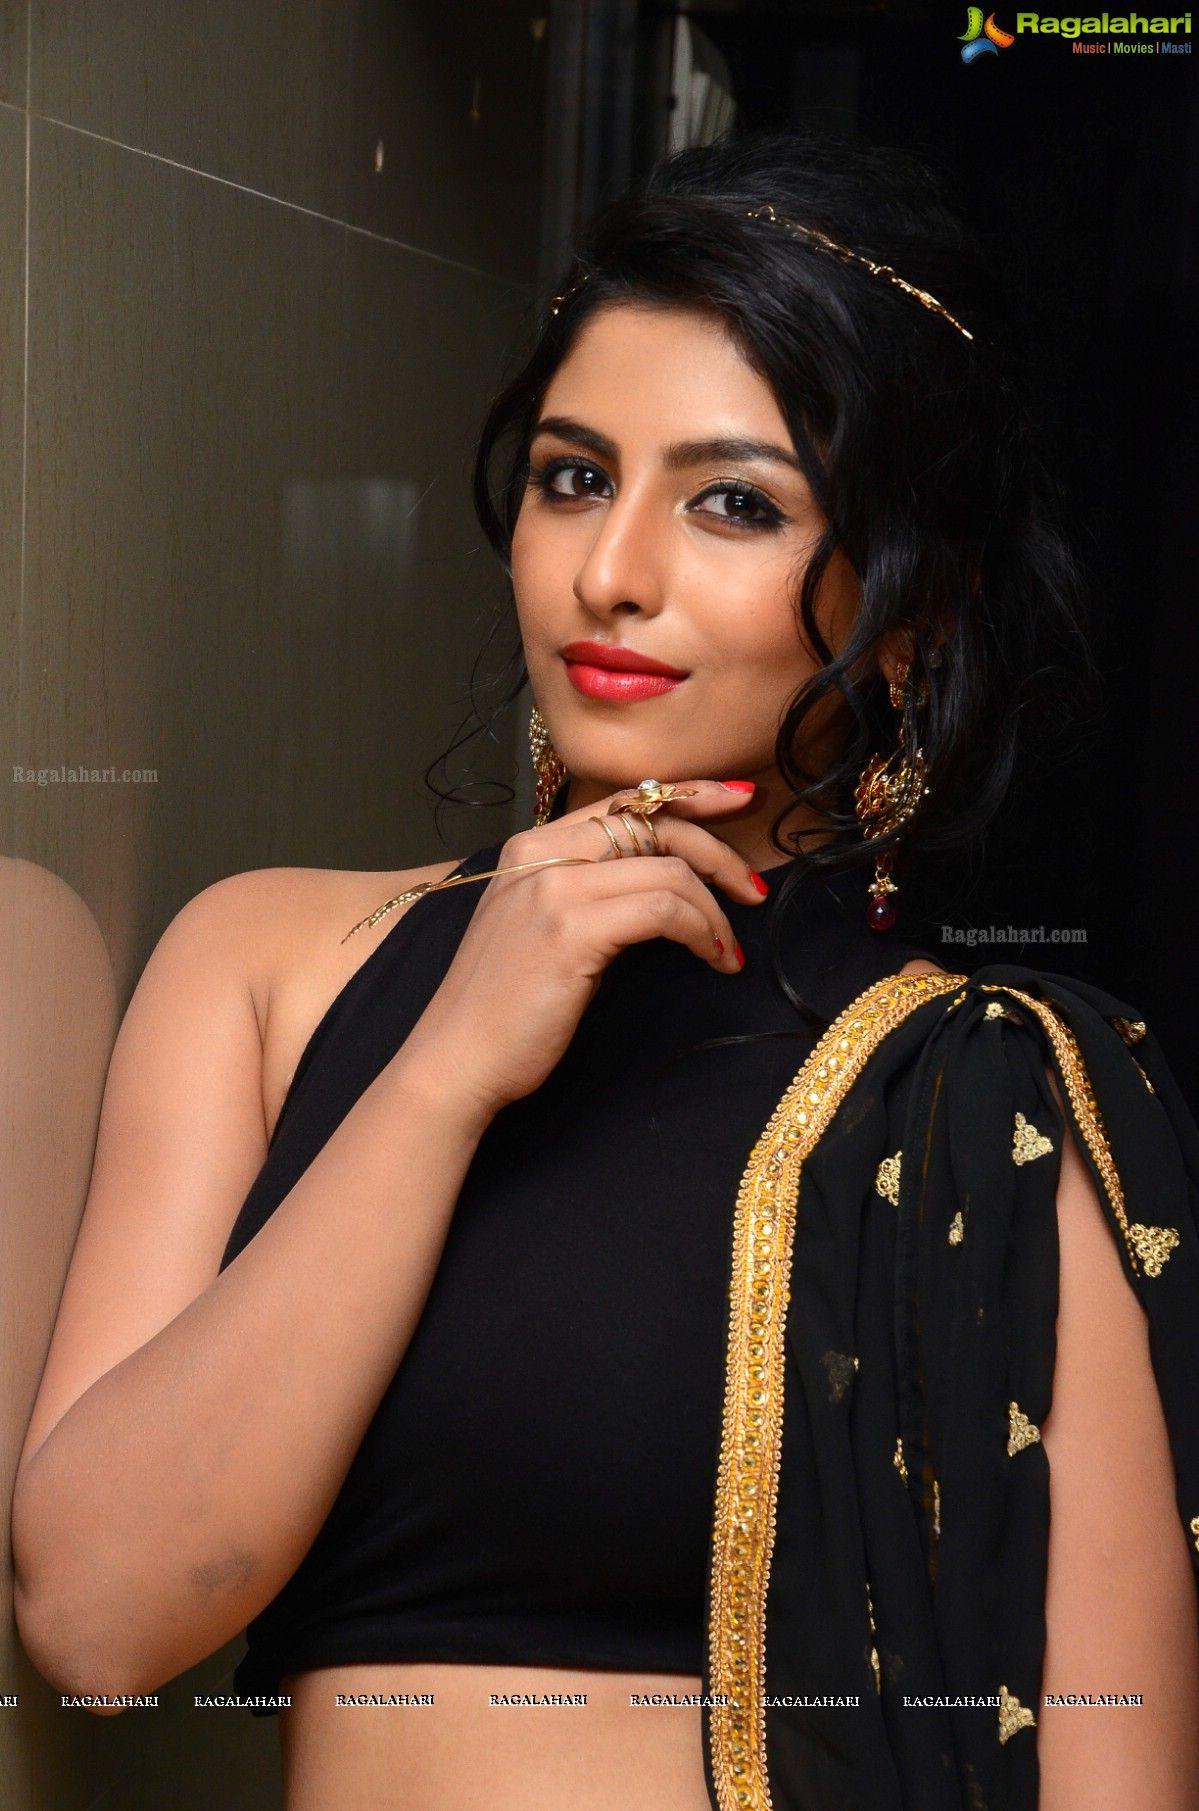 http://www.ragalahari/actress/78595/kruthika-jayakumar-at-rojulu